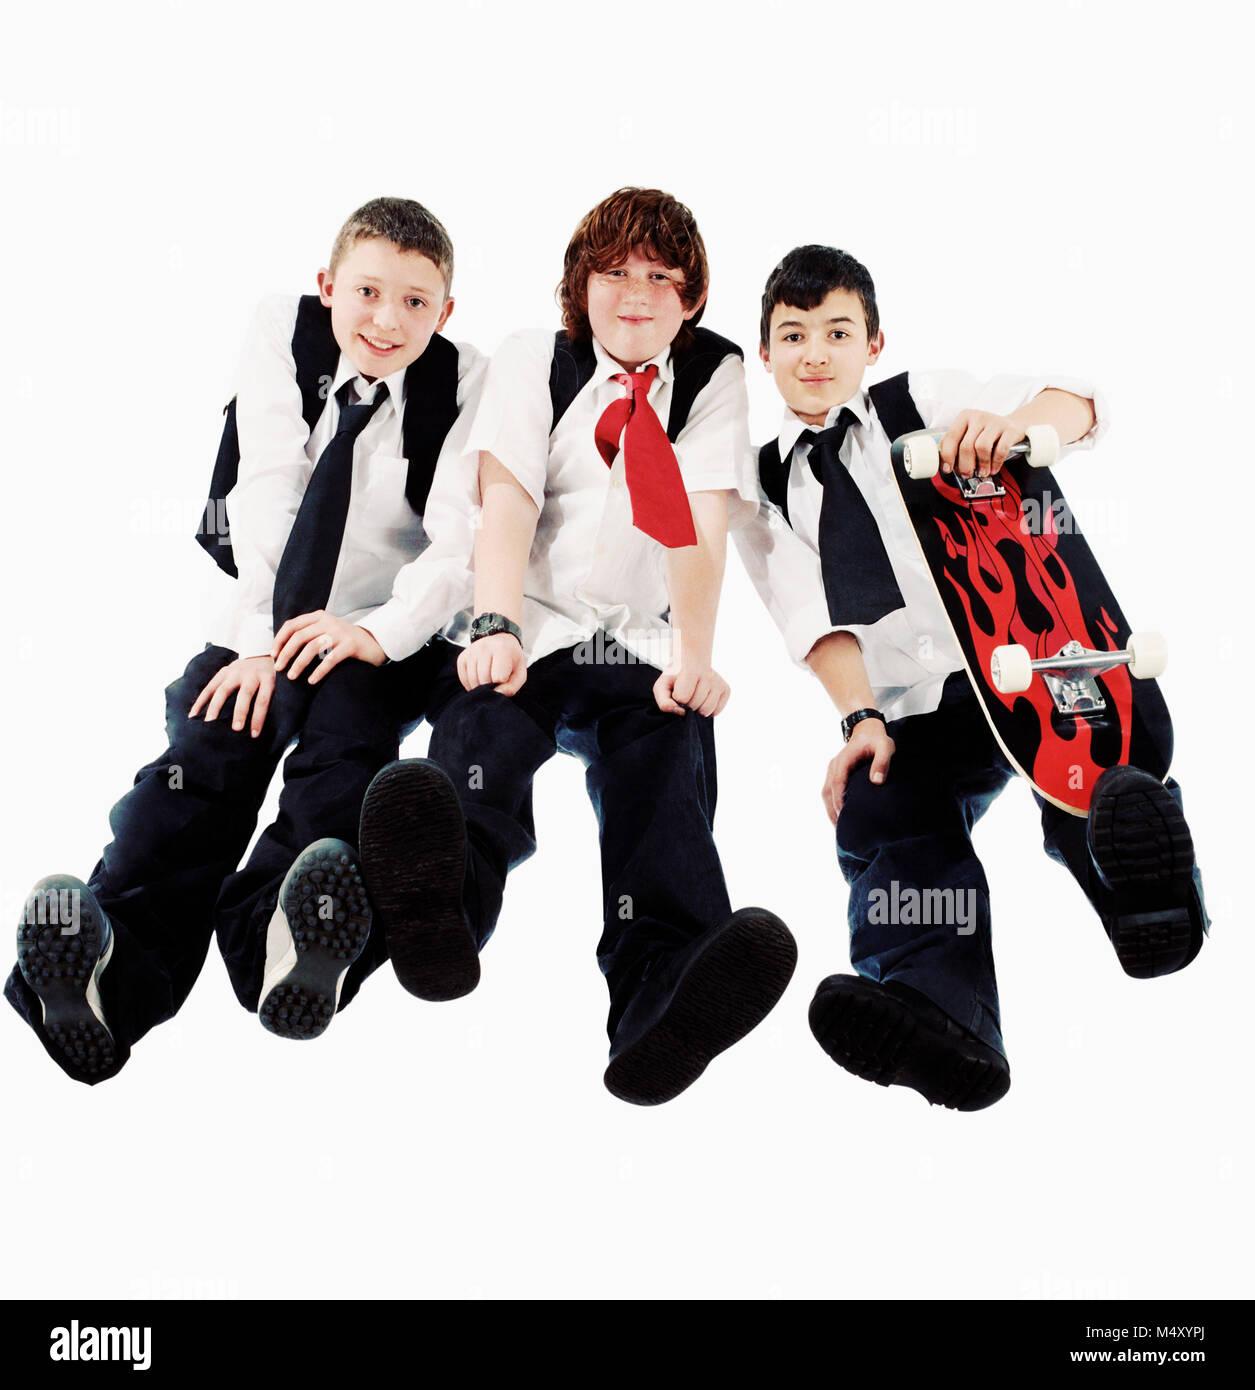 Three secondary schoolboys - Stock Image